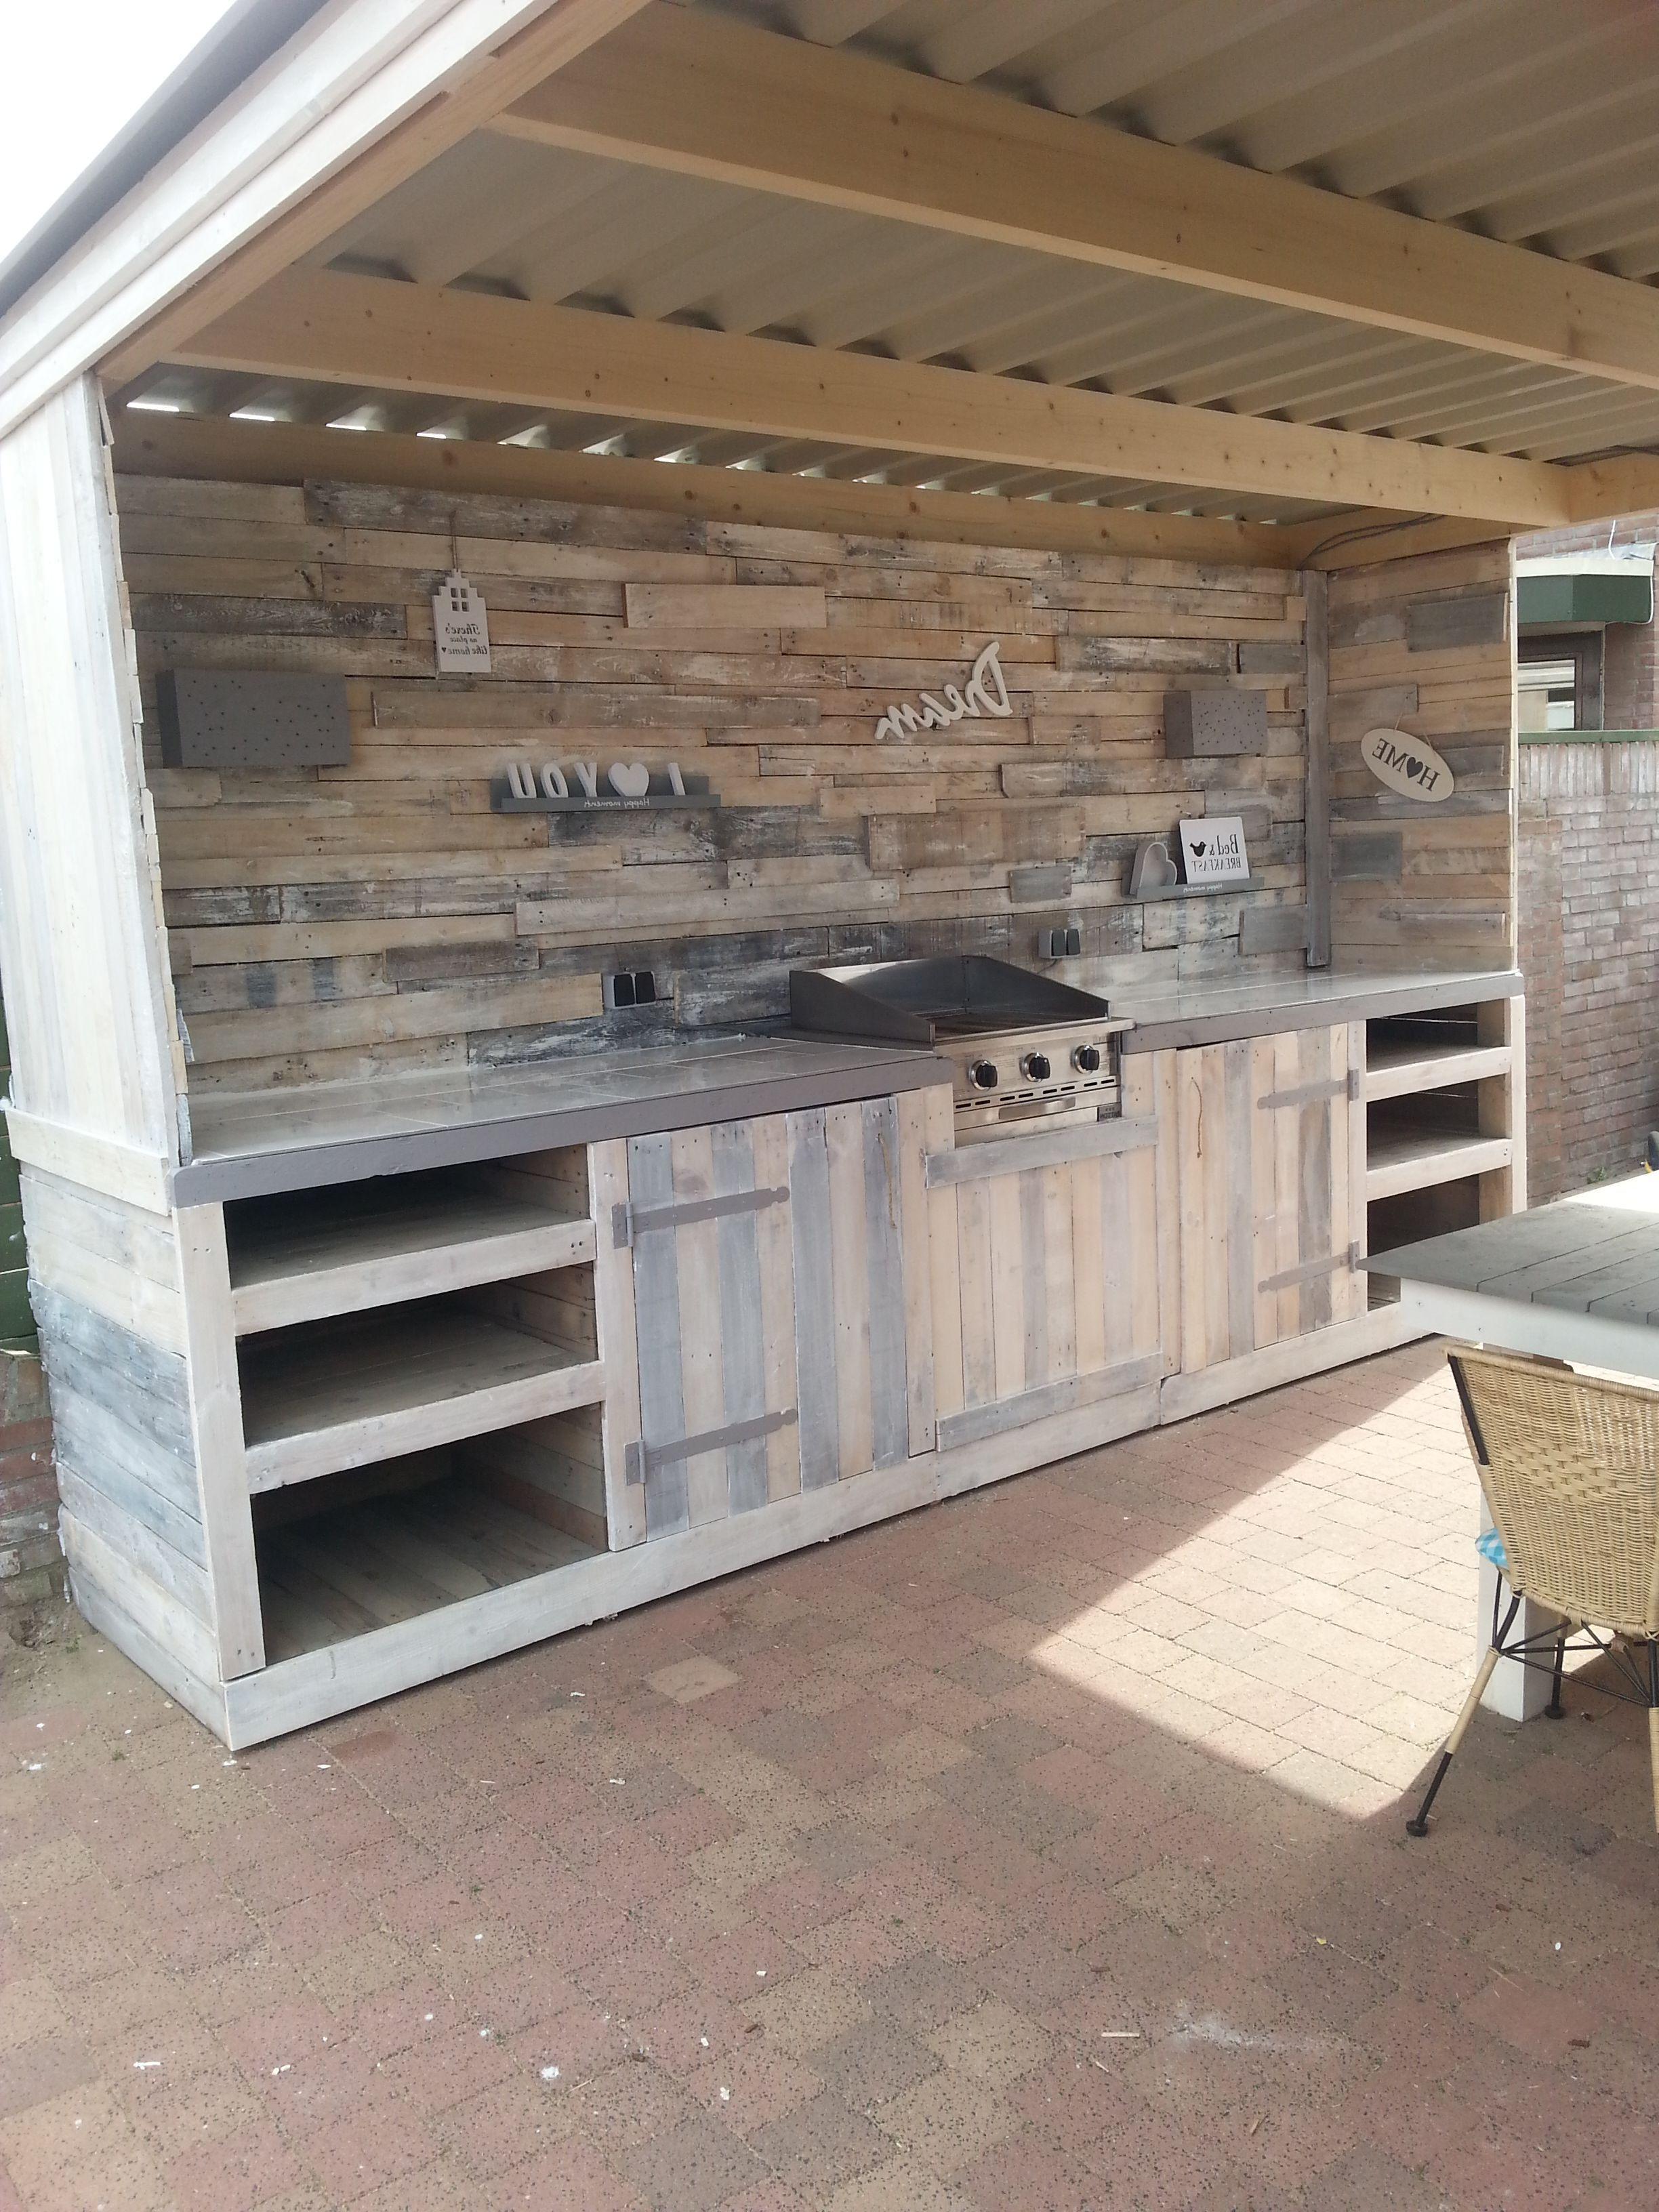 11 Useful Tips For Summer Kitchen Arrangement Outdoor Kitchen Design Outdoor Kitchen Outdoor Kitchen Design Layout